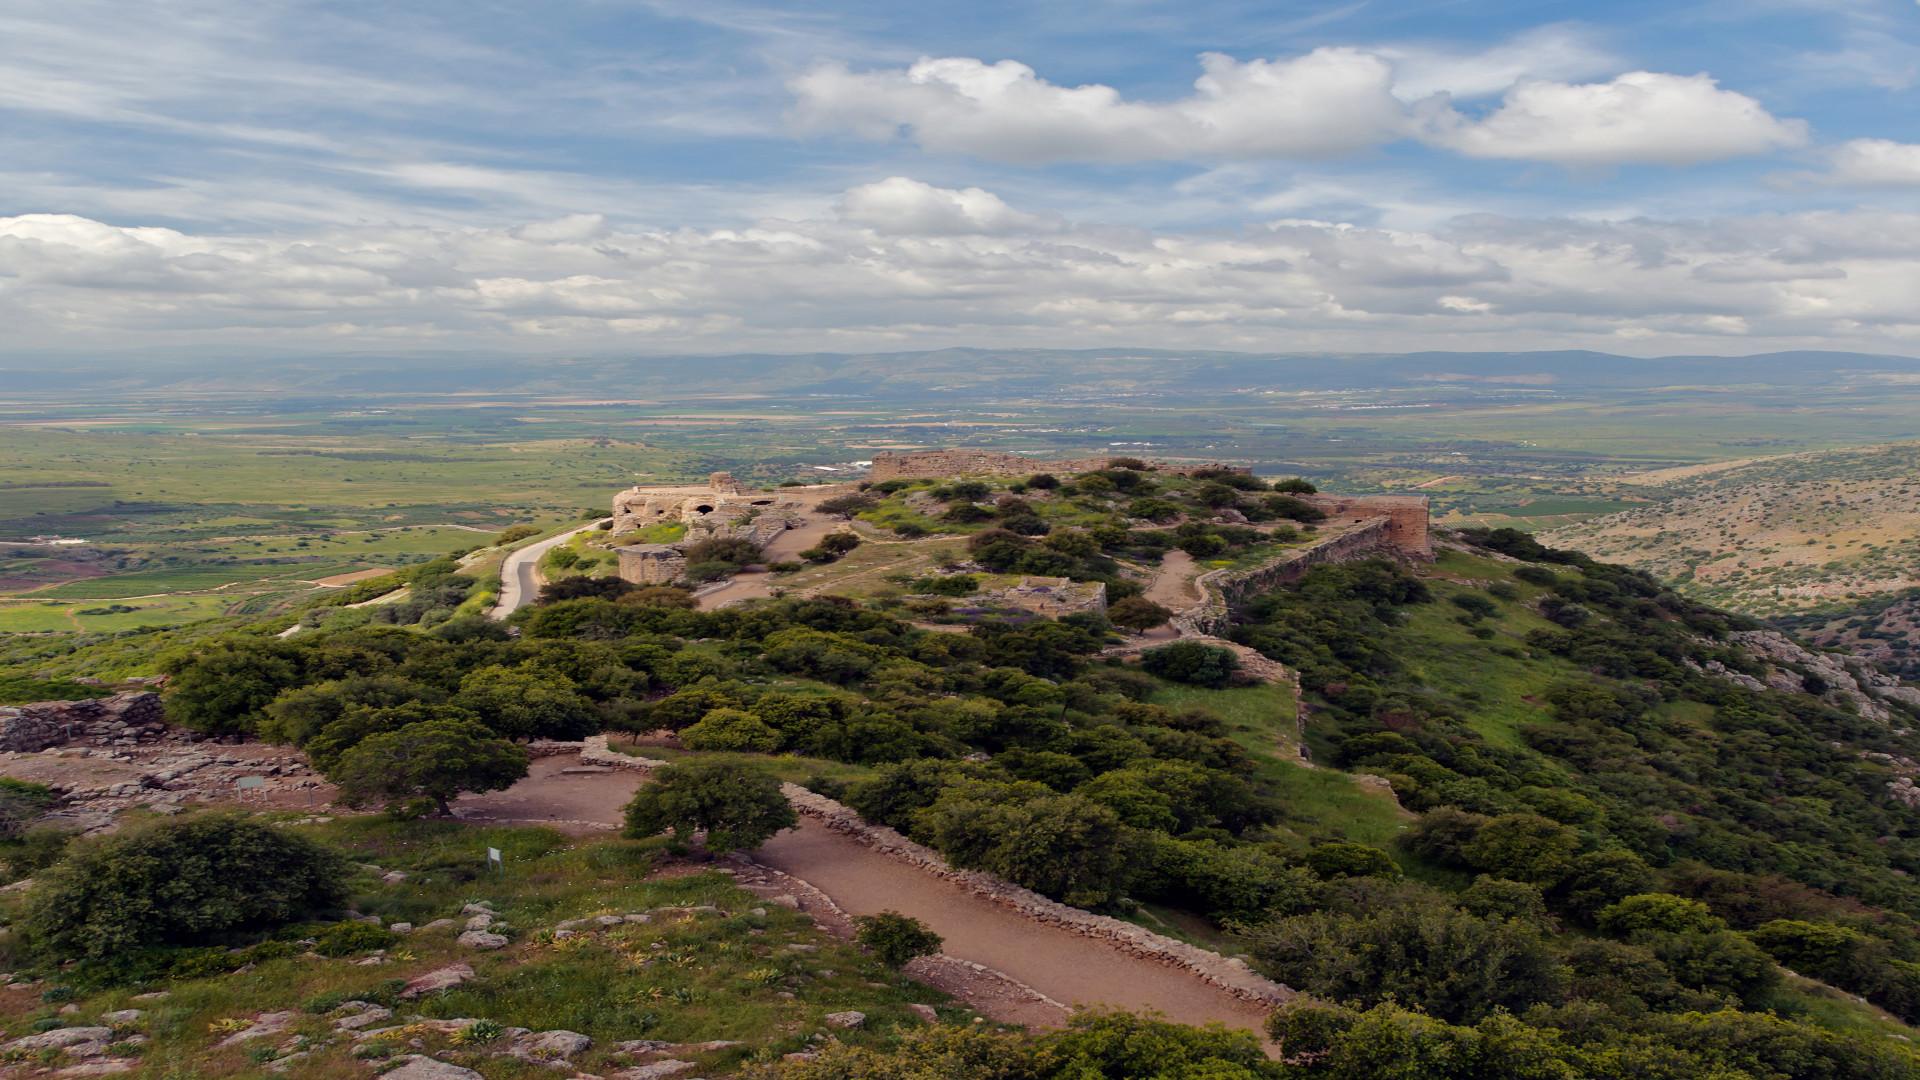 Nimrod fortress, Golan hoogvlaktes, Israël